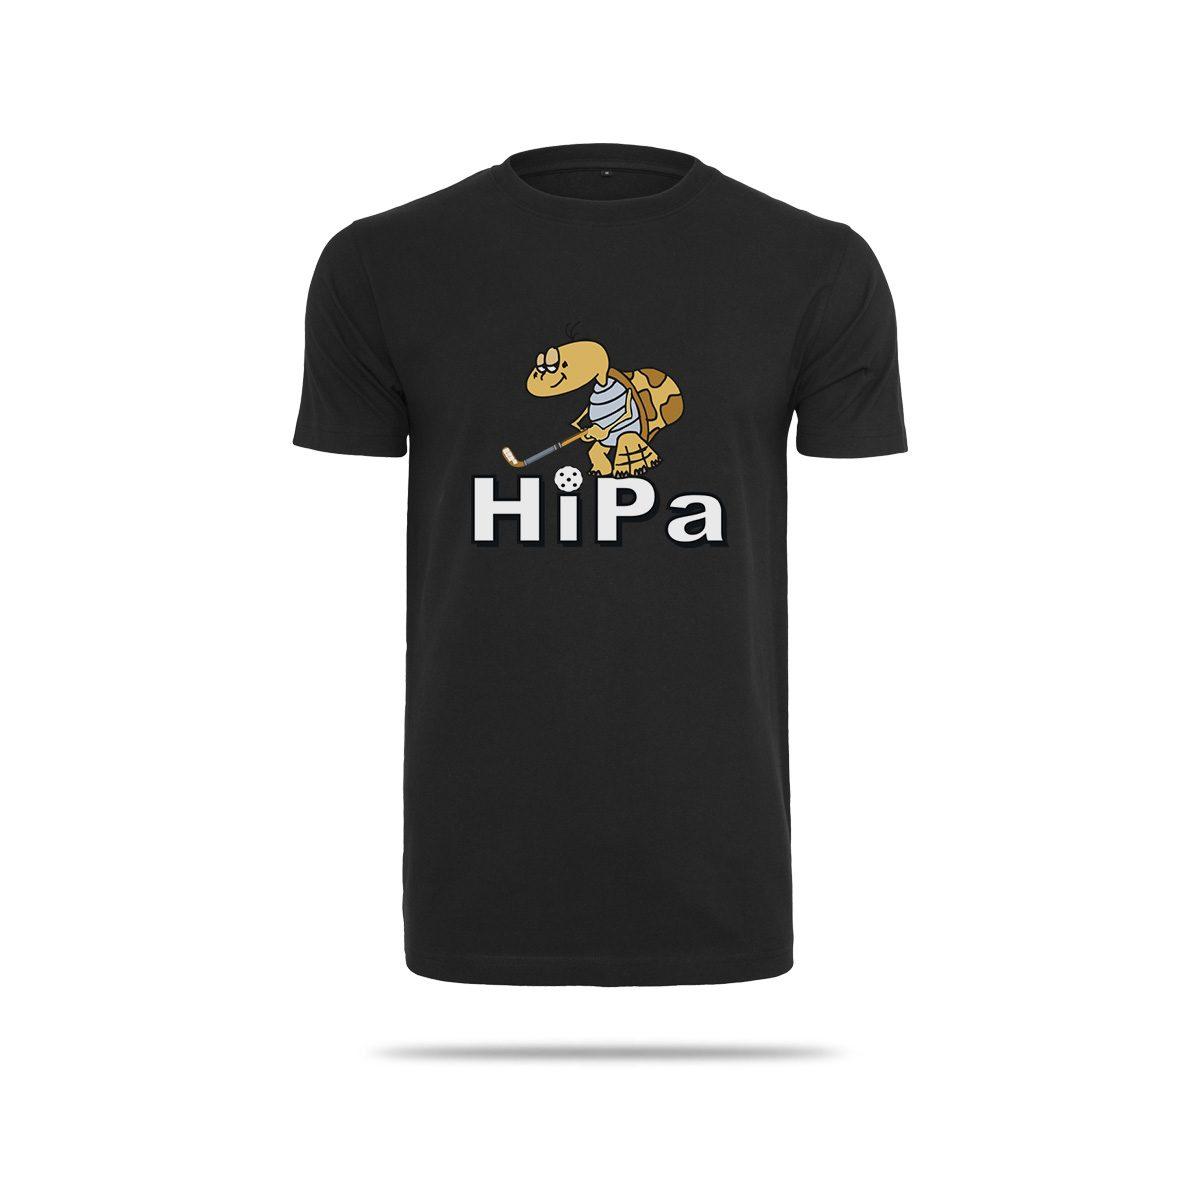 Hipa-6005-musta